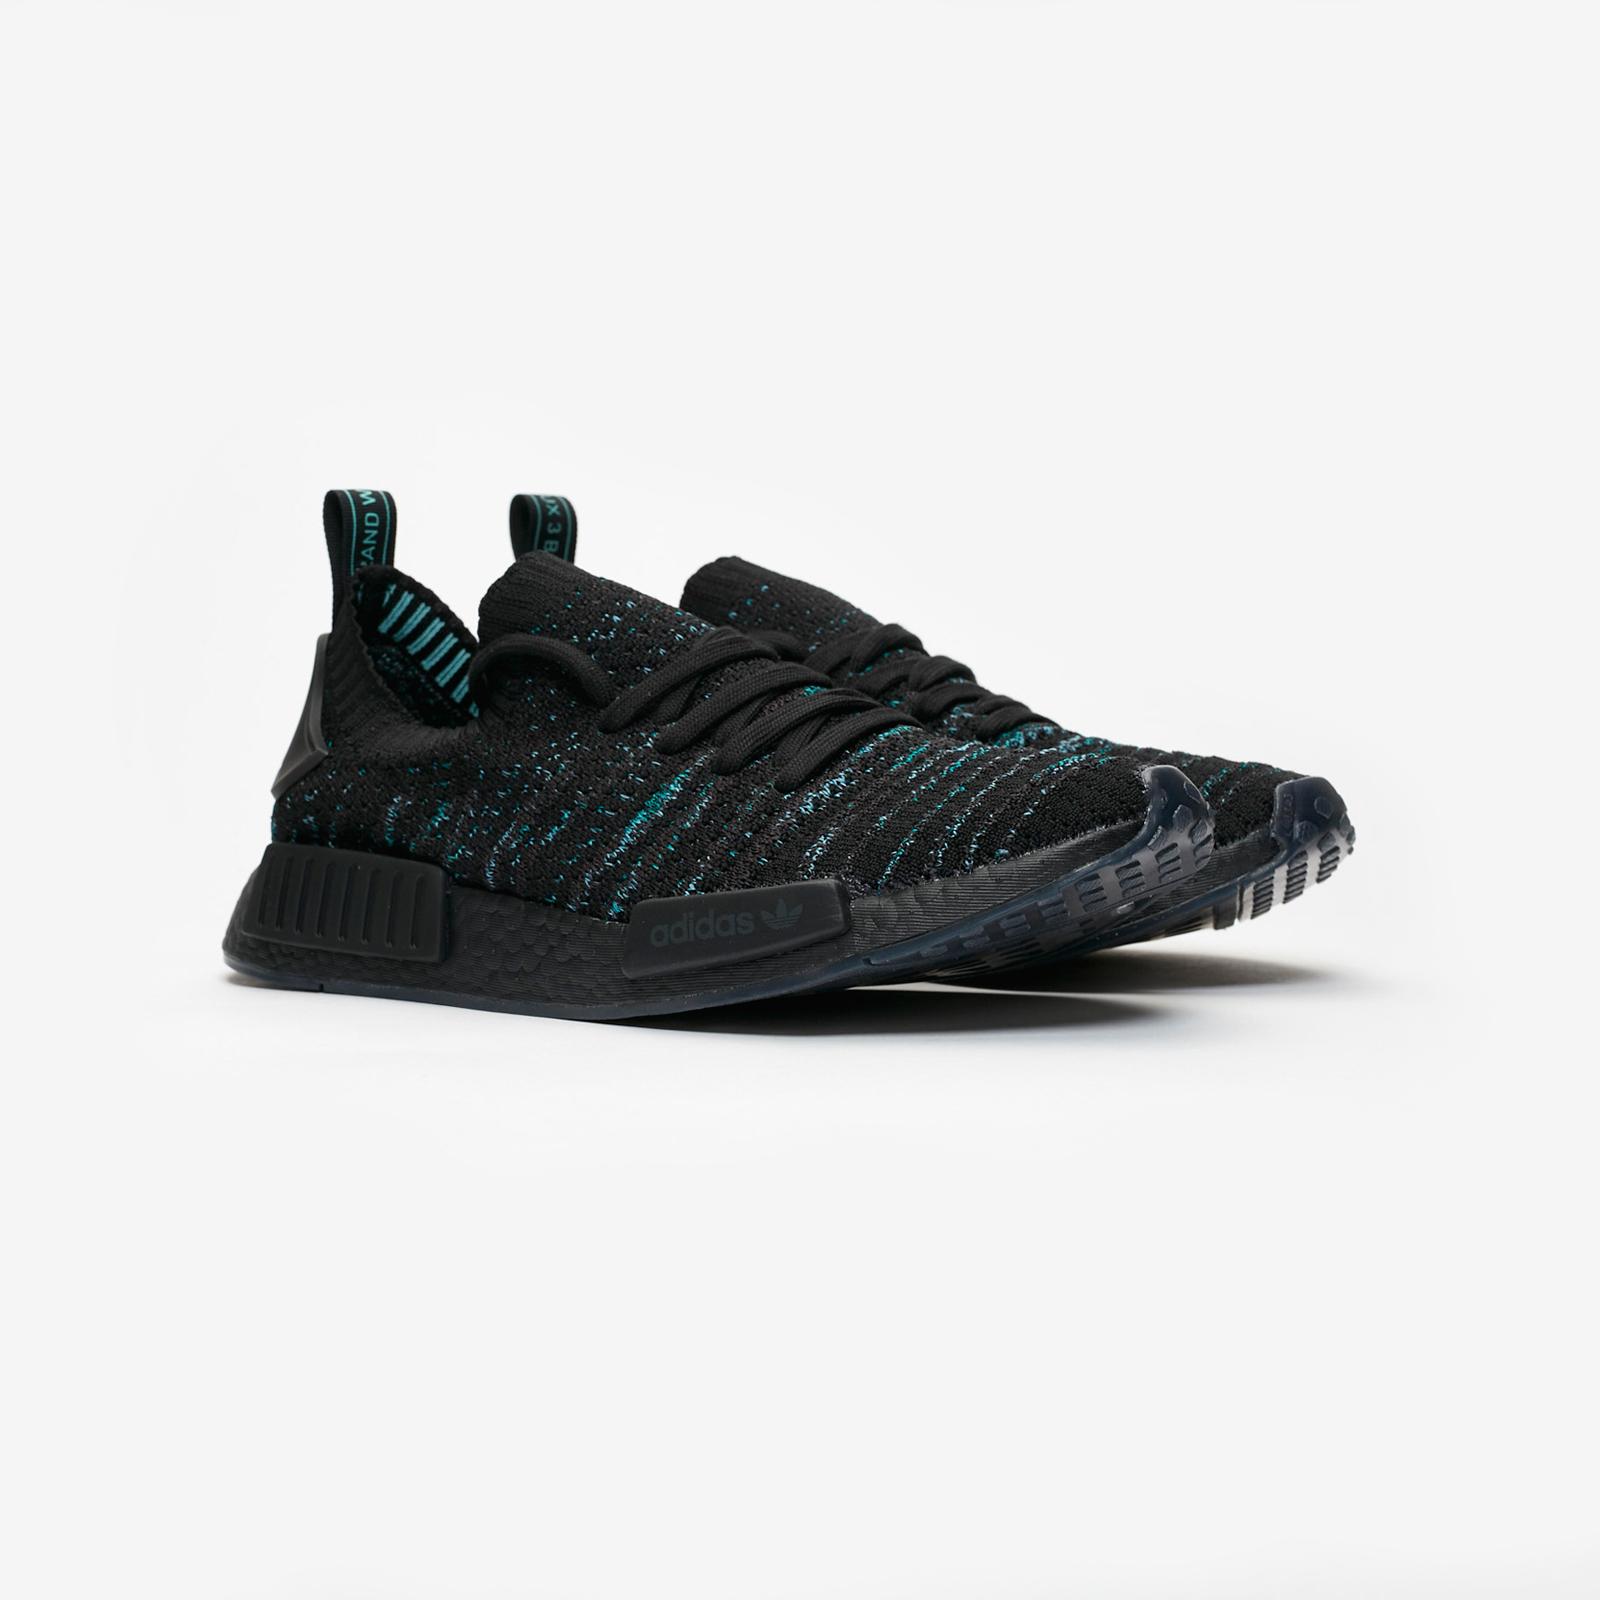 half off 12d85 620ba adidas NMD_R1 STLT Parley PK - Aq0943 - Sneakersnstuff ...